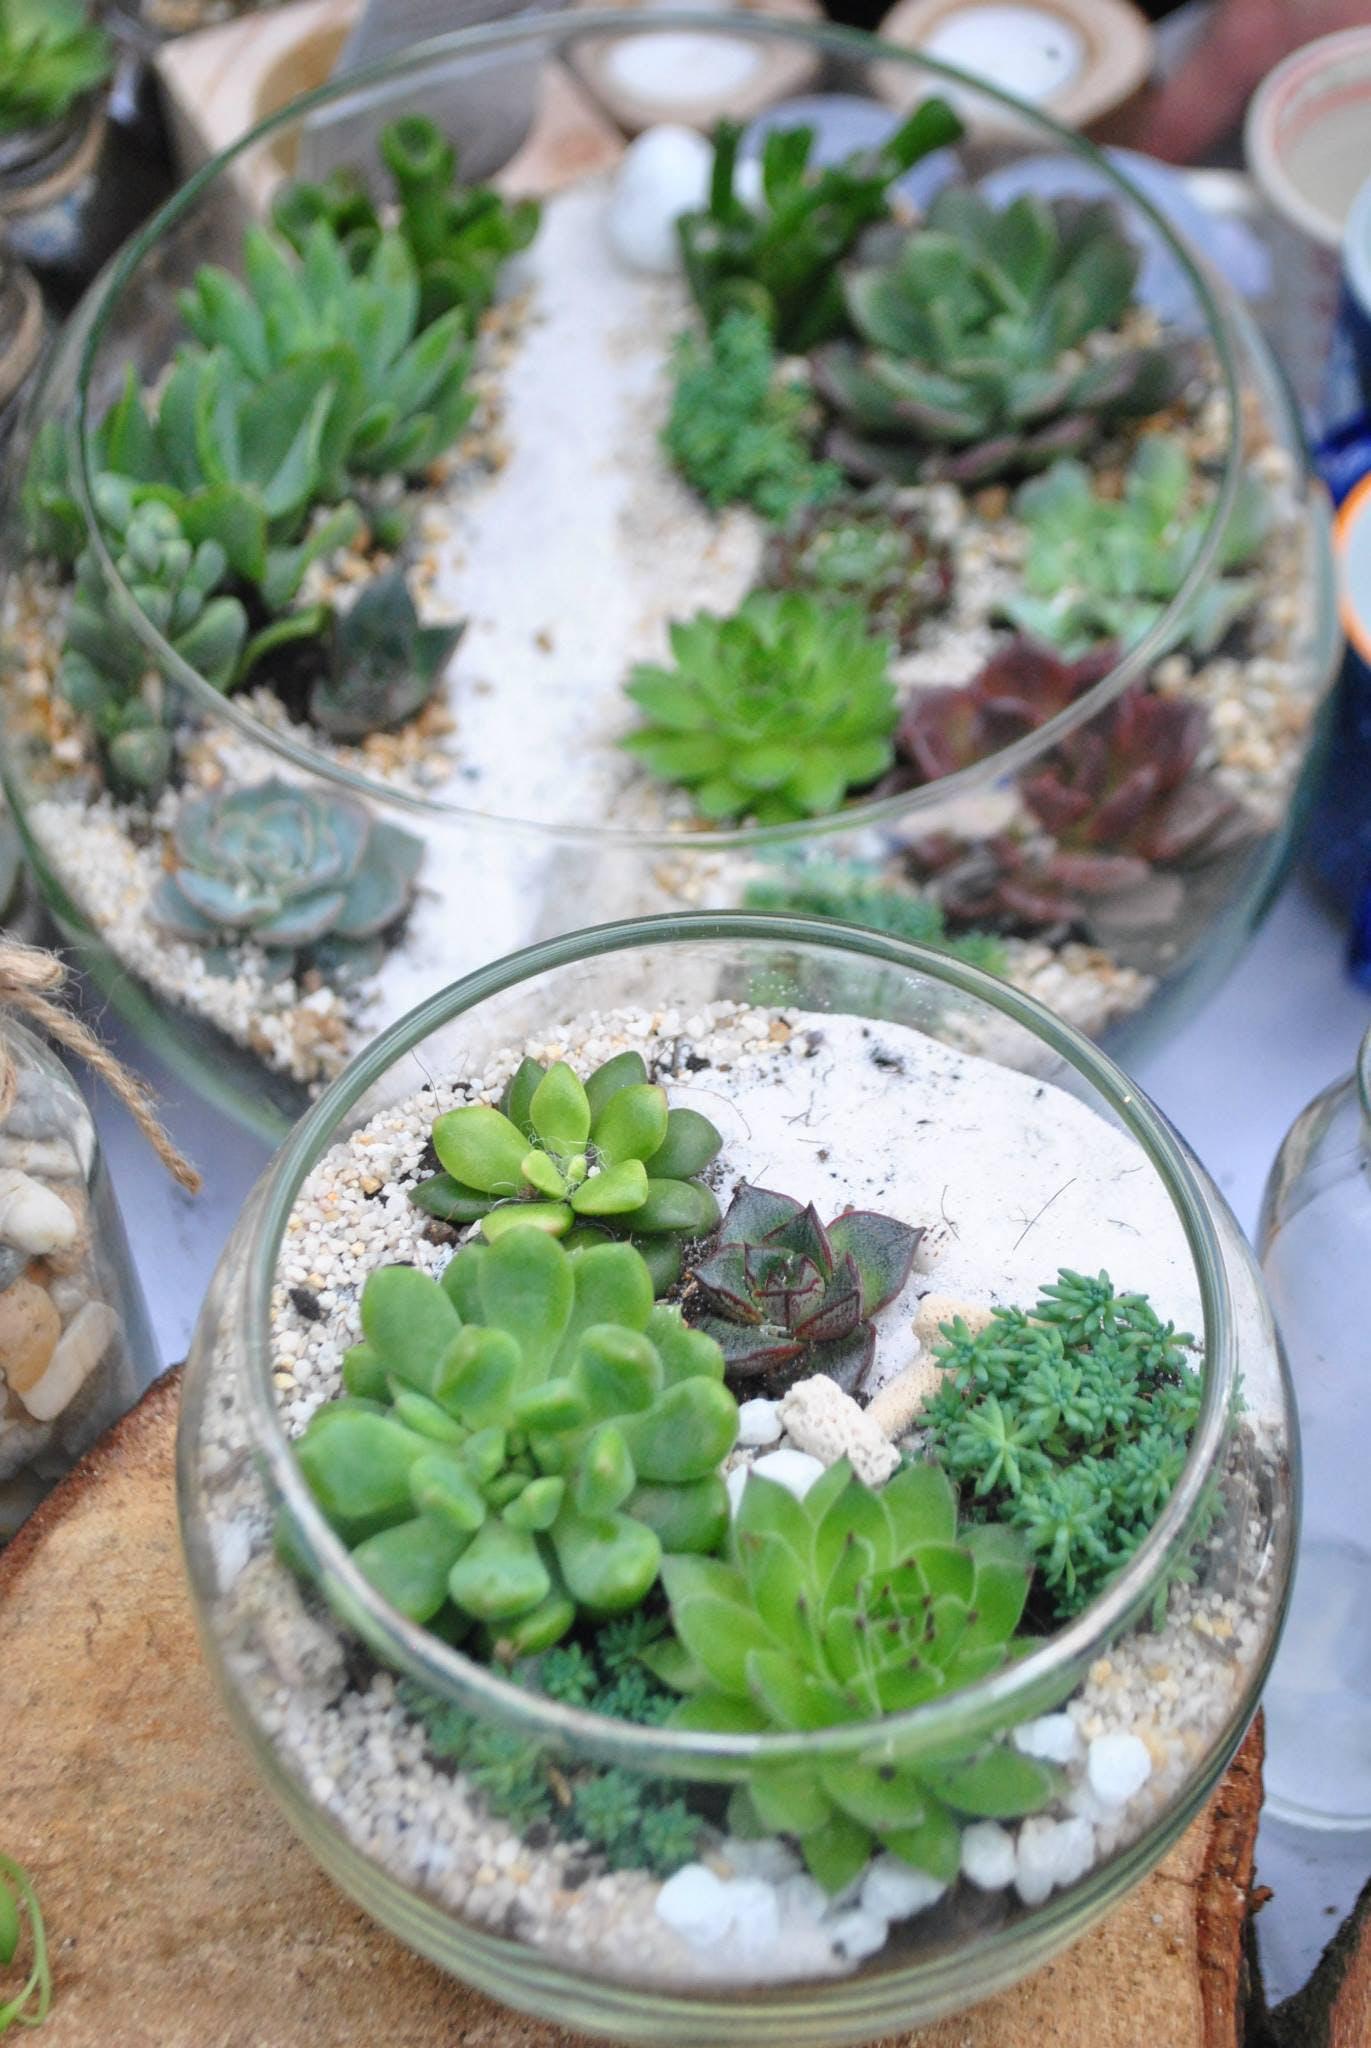 Free stock photo of Secret Garden, succulent plants, terrarium